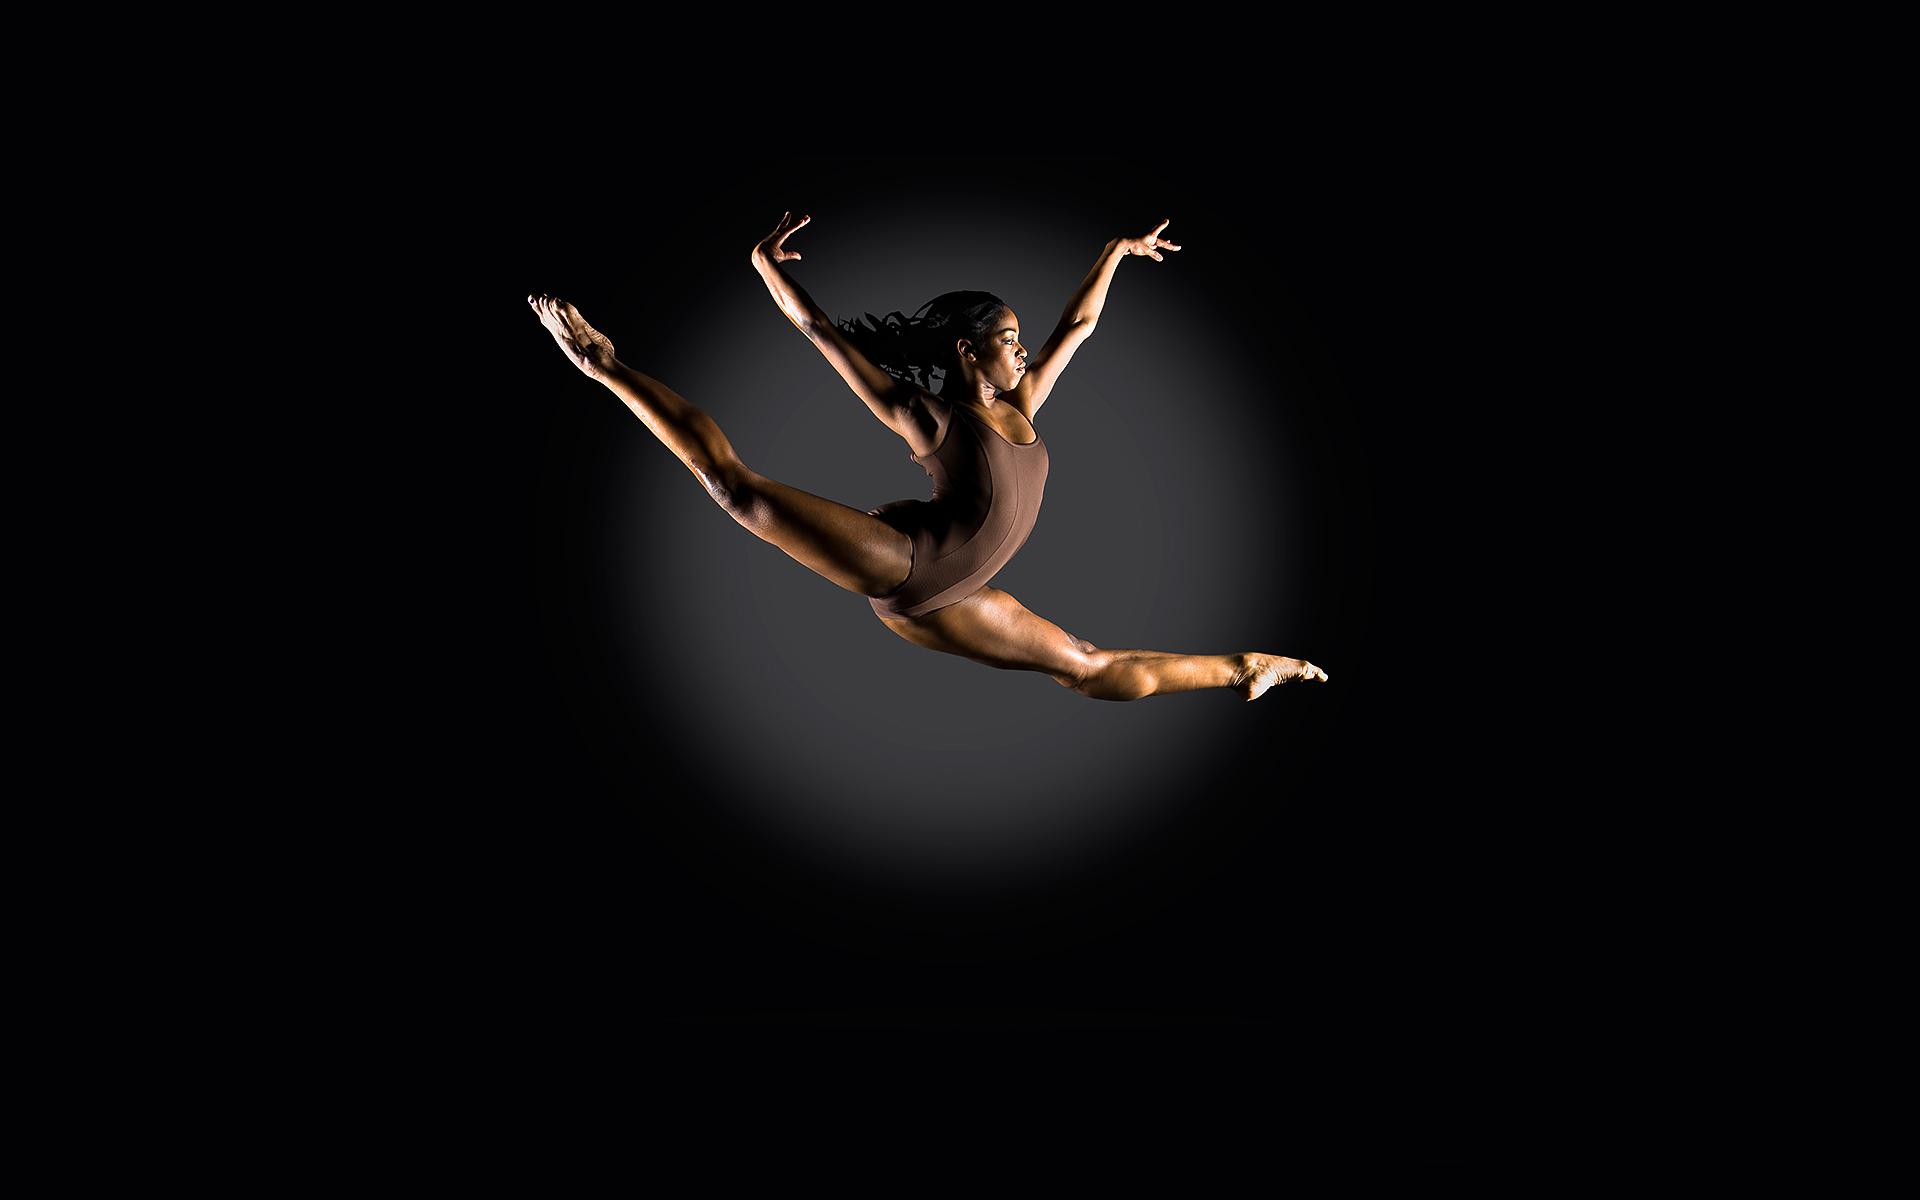 jazz dancer wallpaper - photo #25